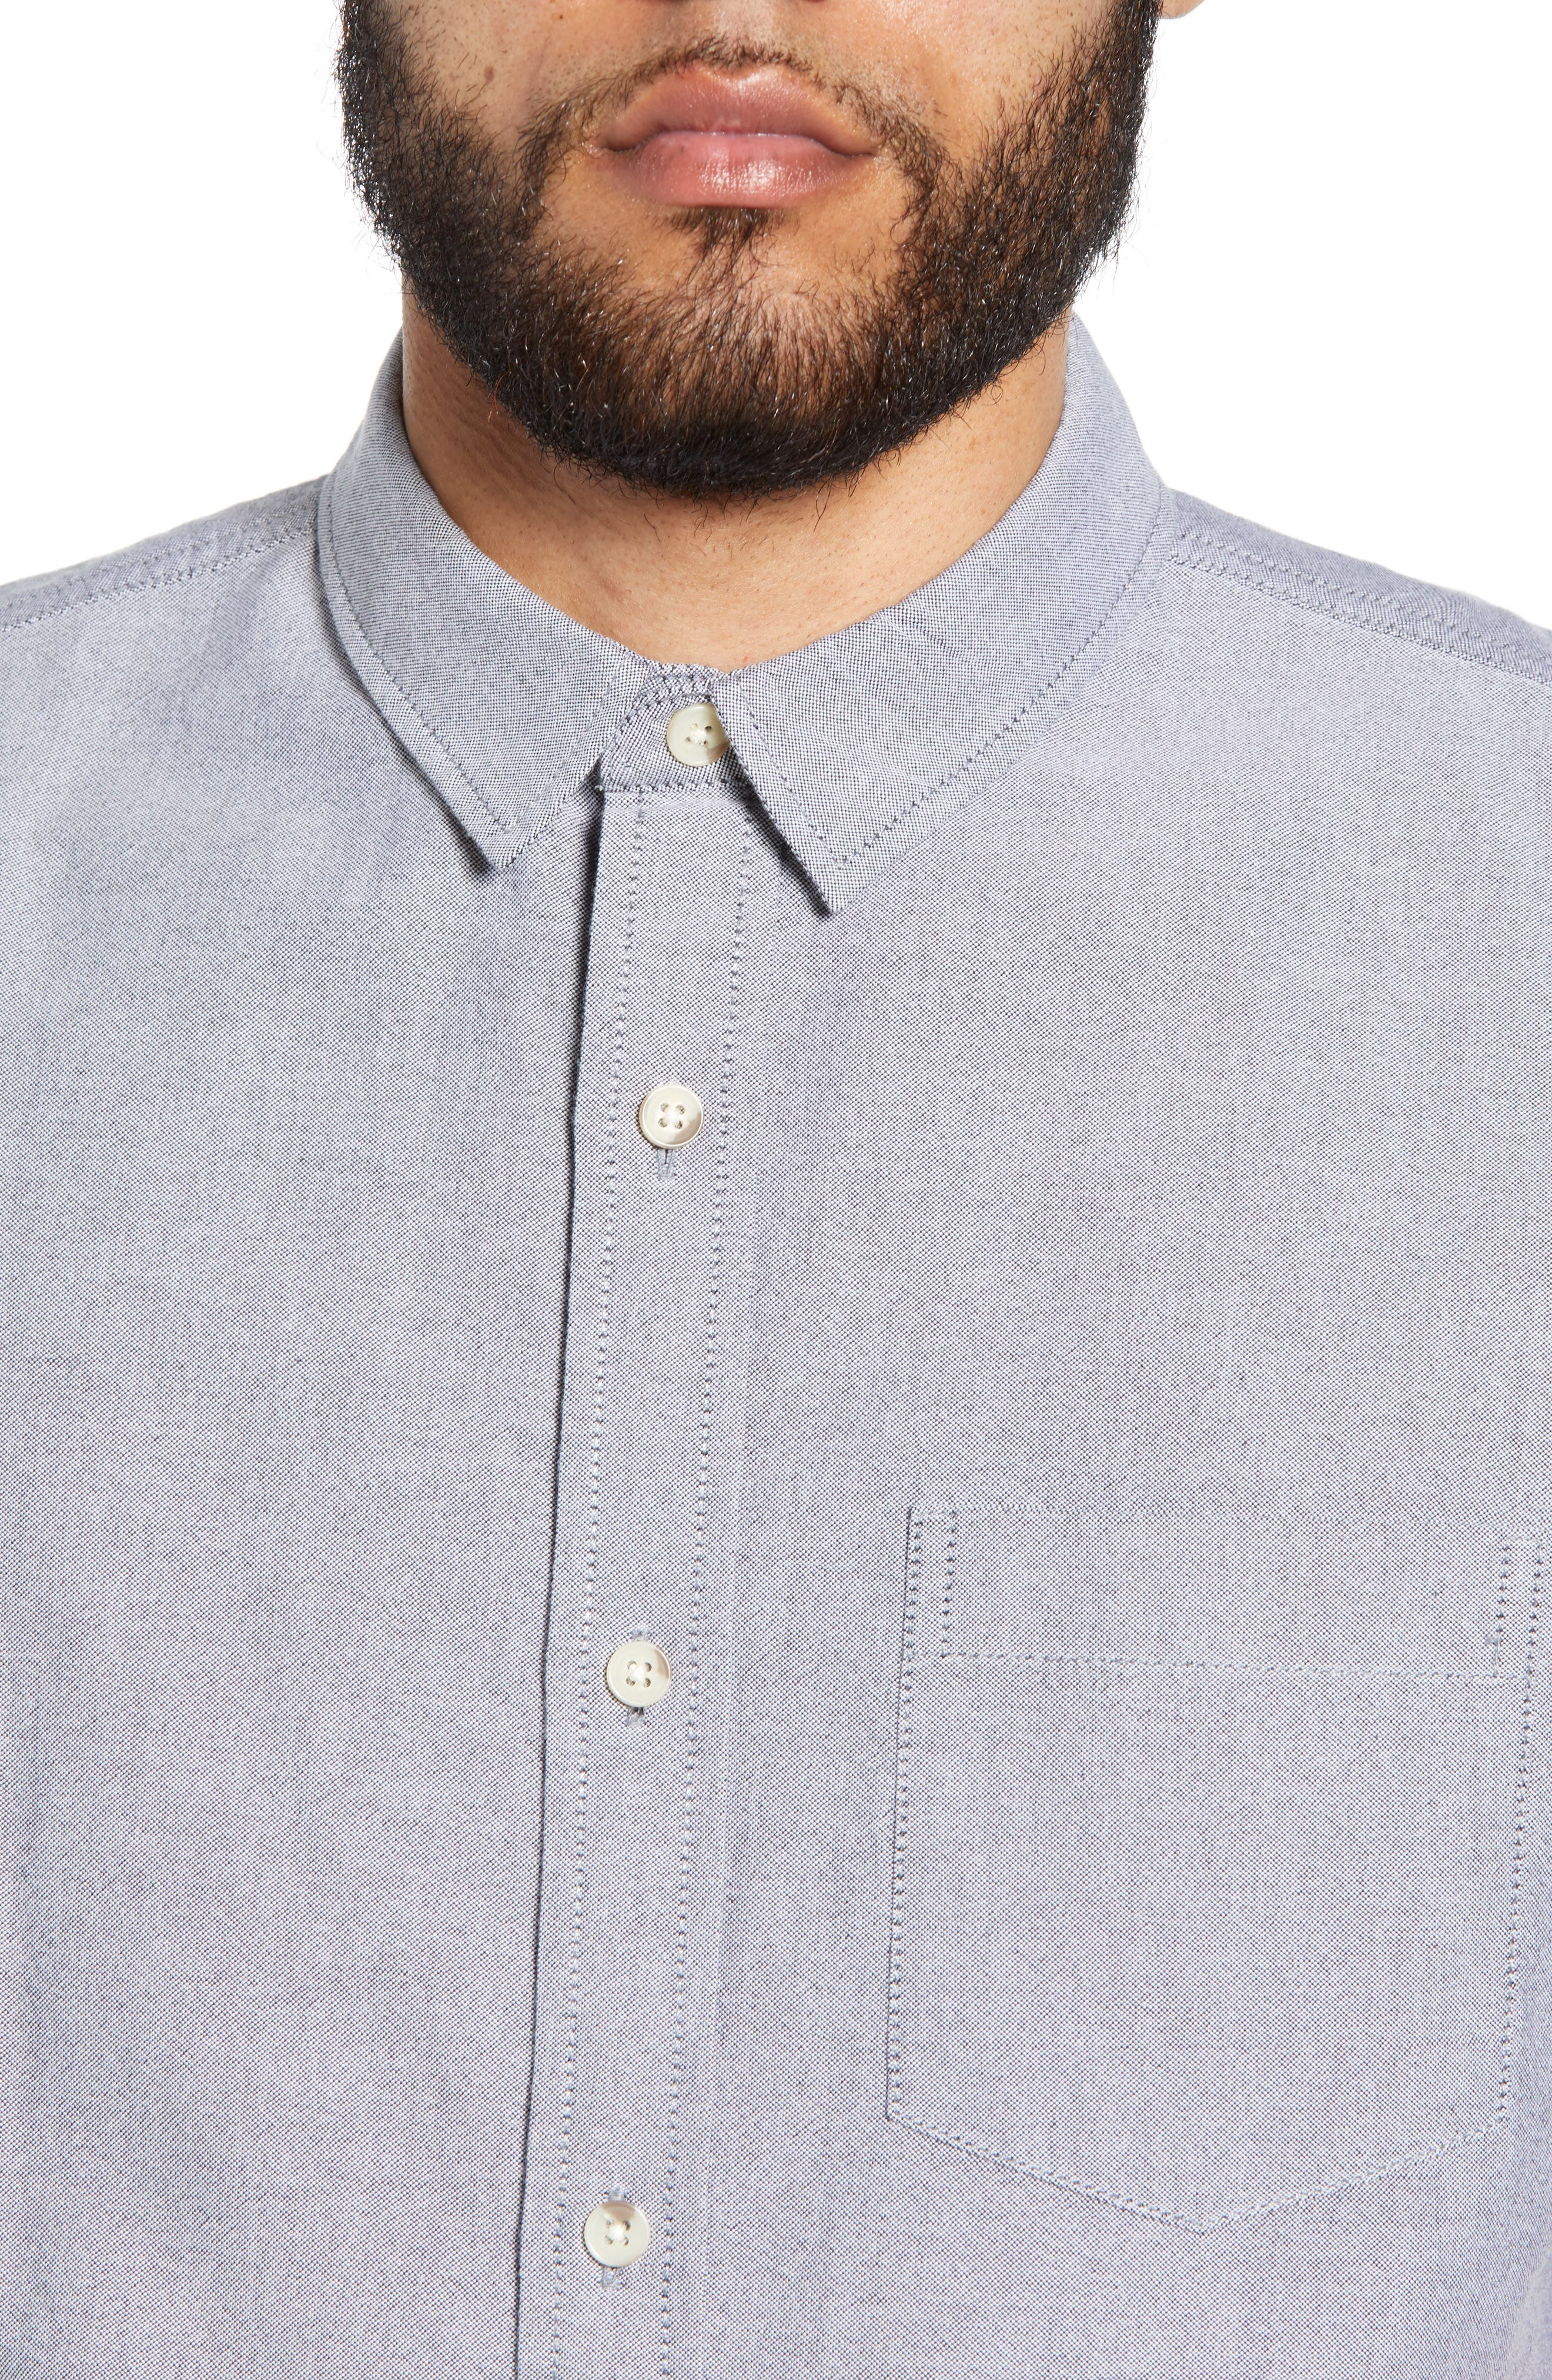 THE RAIL, Oxford Cloth Woven Shirt, Alternate thumbnail 2, color, BLACK ROCK-WHITE